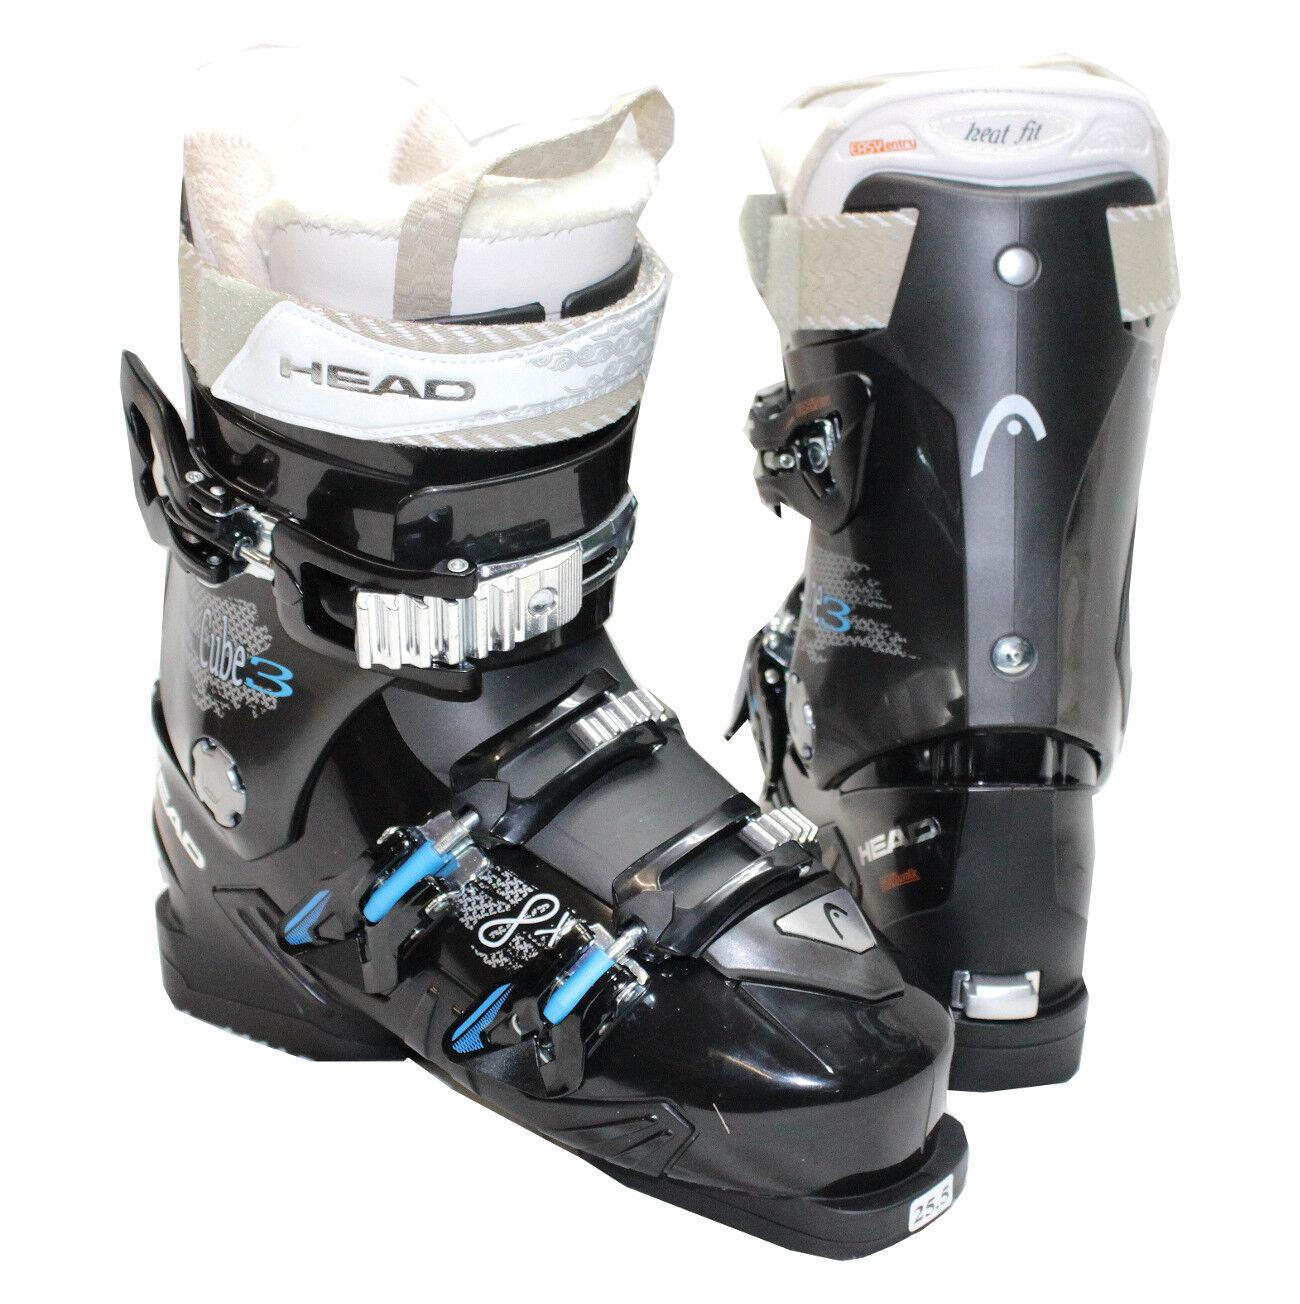 Femmes Chaleur X Chaussure Doublure 3 Cube Ski De Fit Head 8 TIqxR08fw